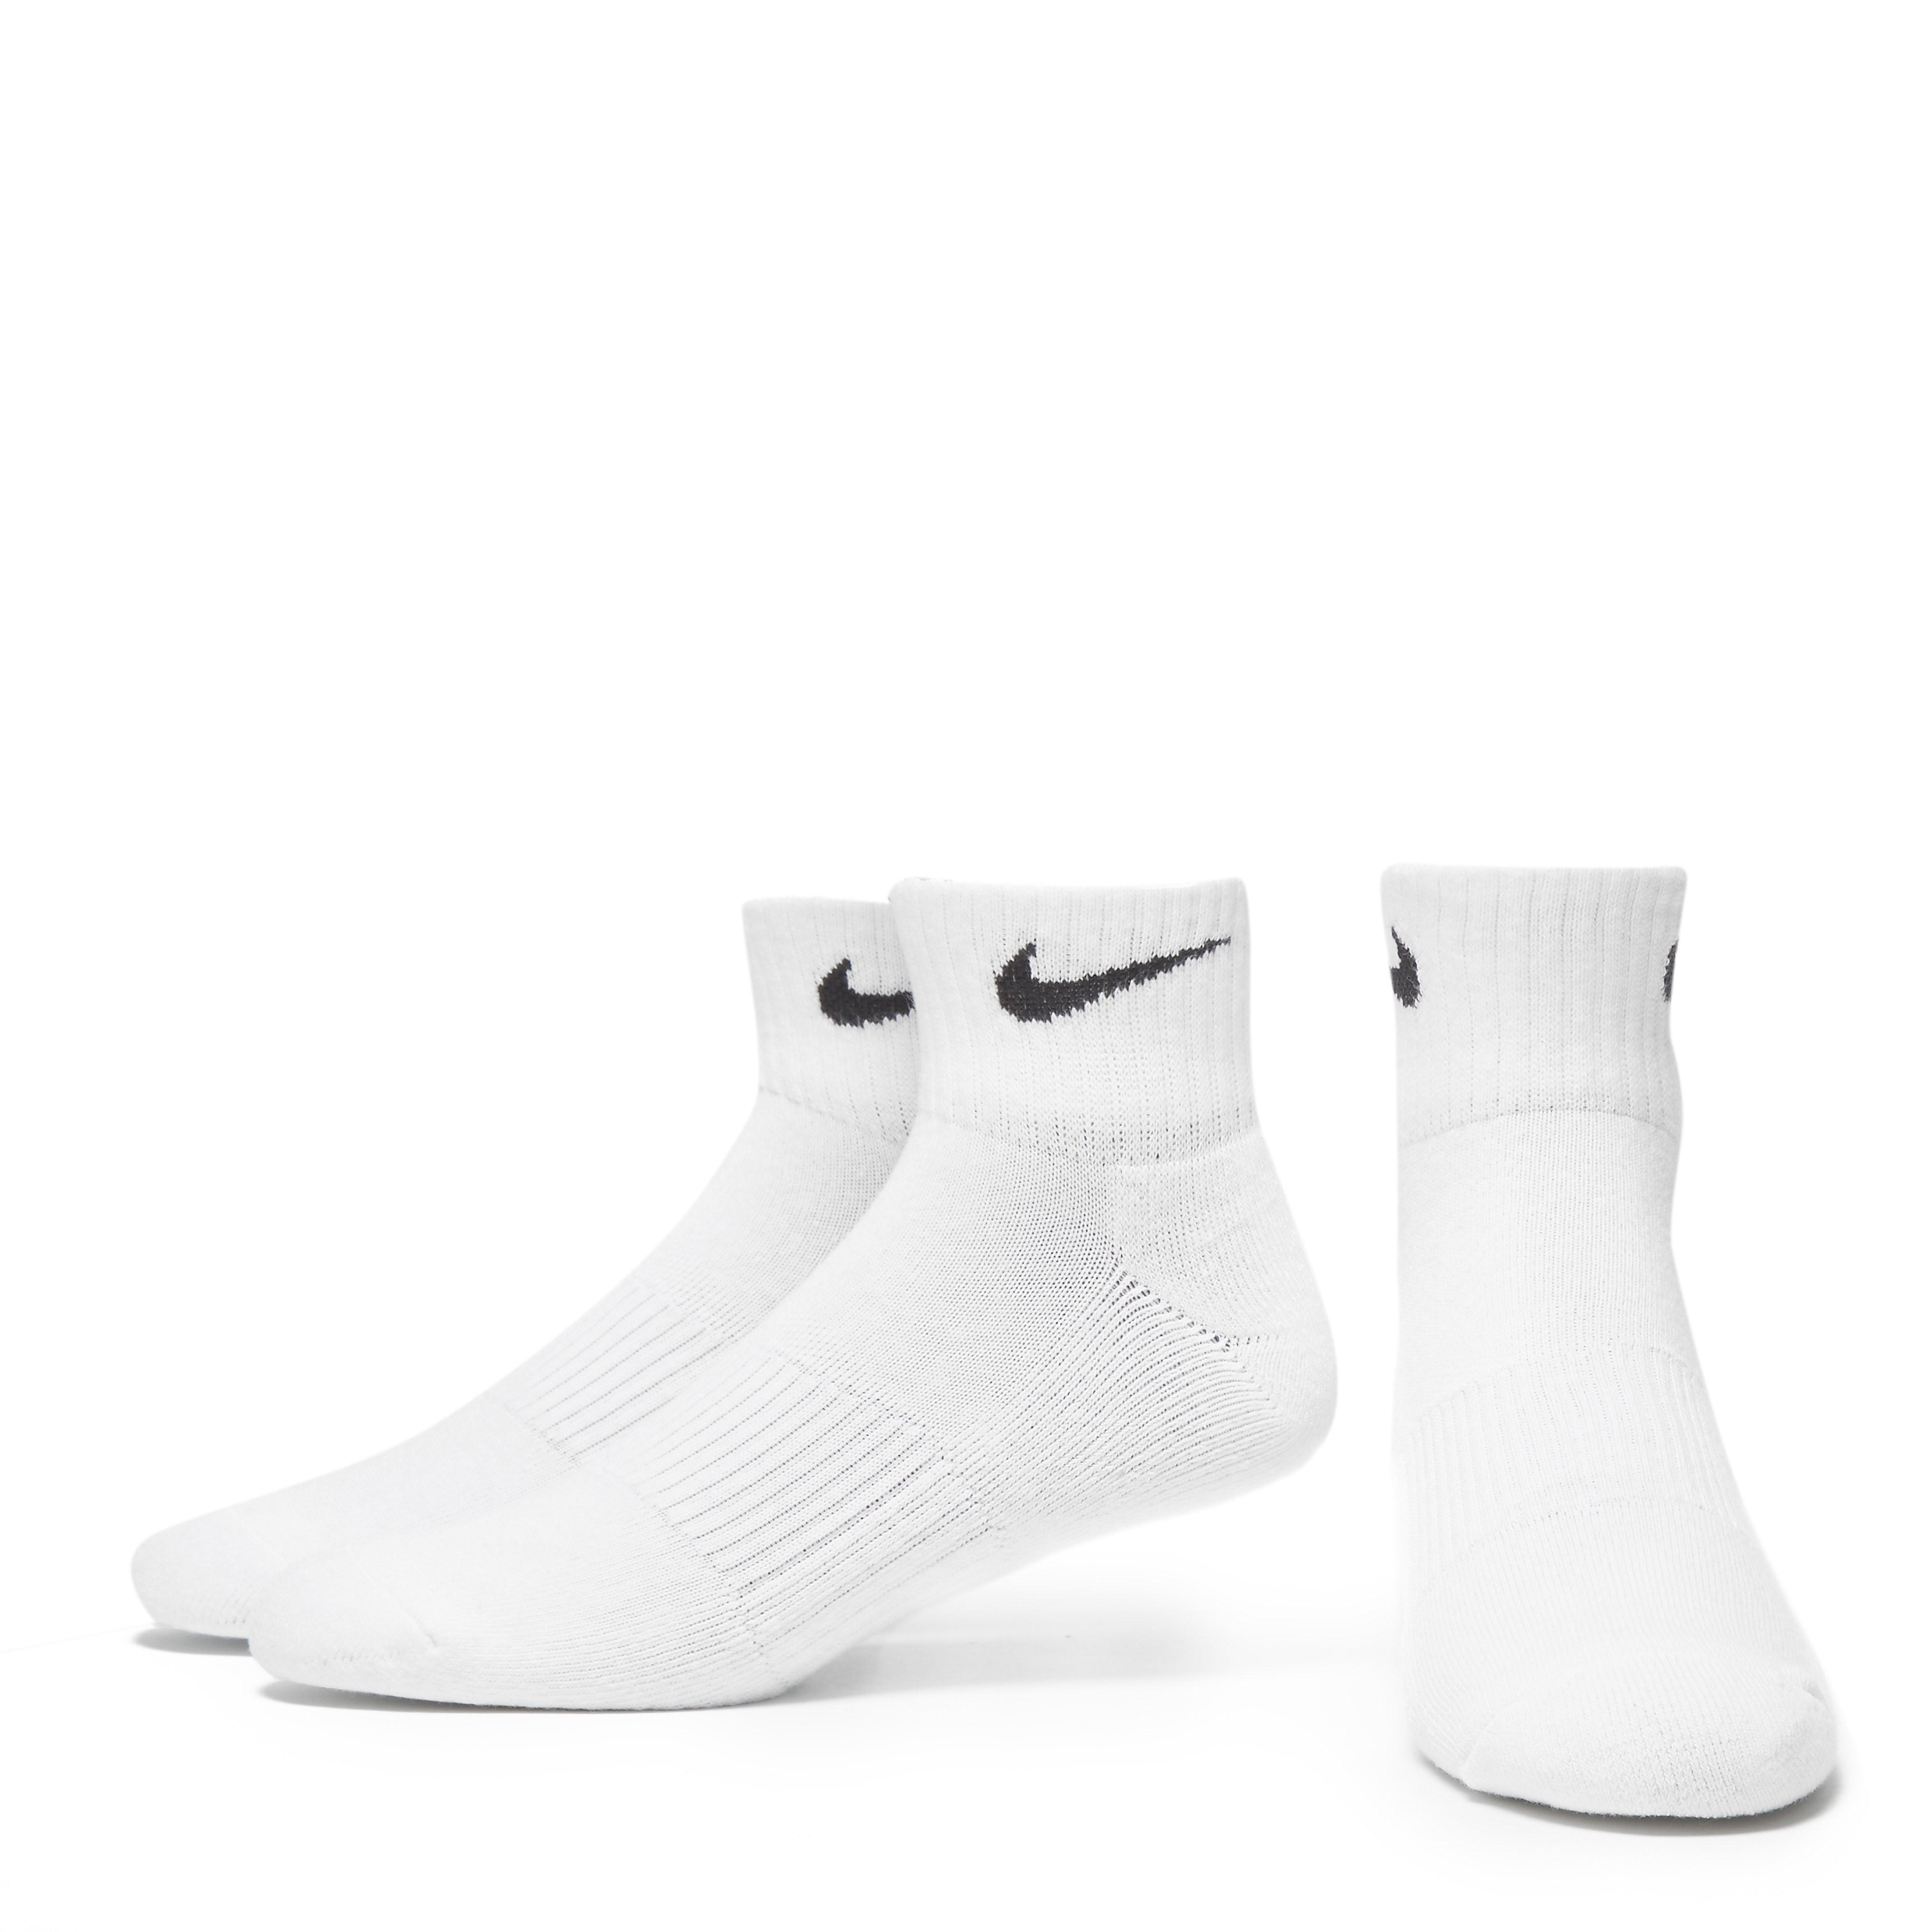 Nike 3 Pack Cotton Cushion Quarter Socks